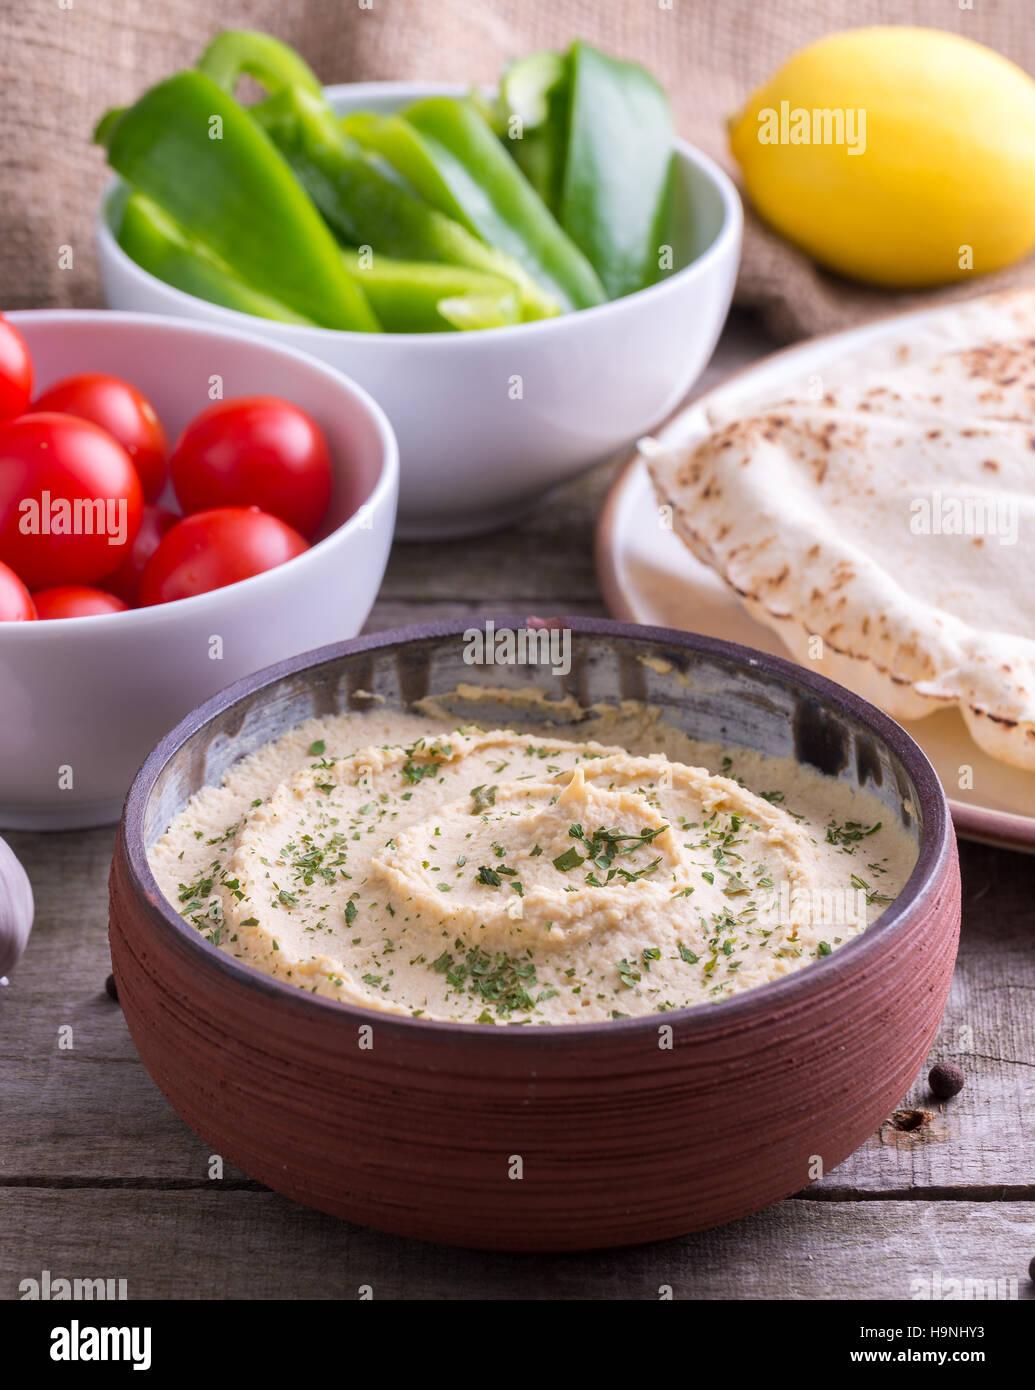 Humus in homemade bowl chapati, lemon and vegetable. - Stock Image